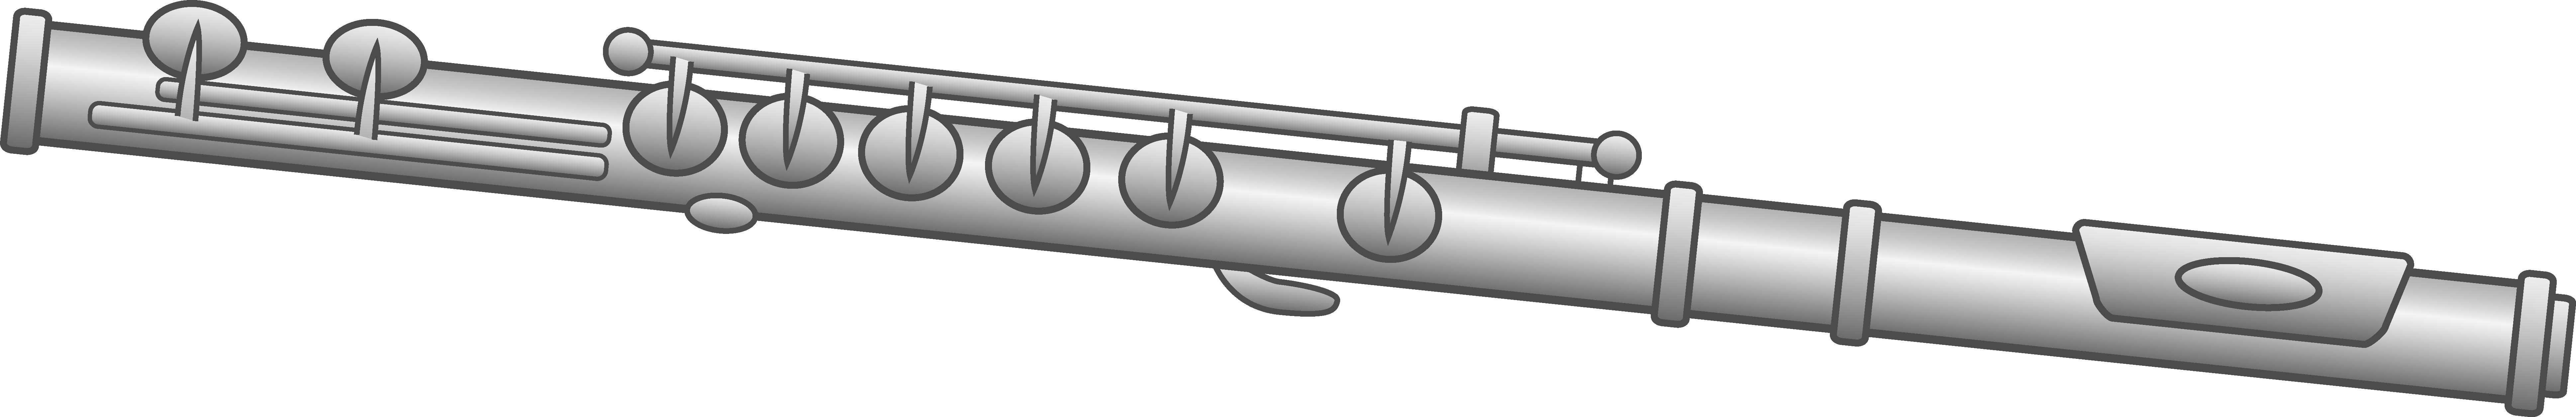 Flute Clipart Design.